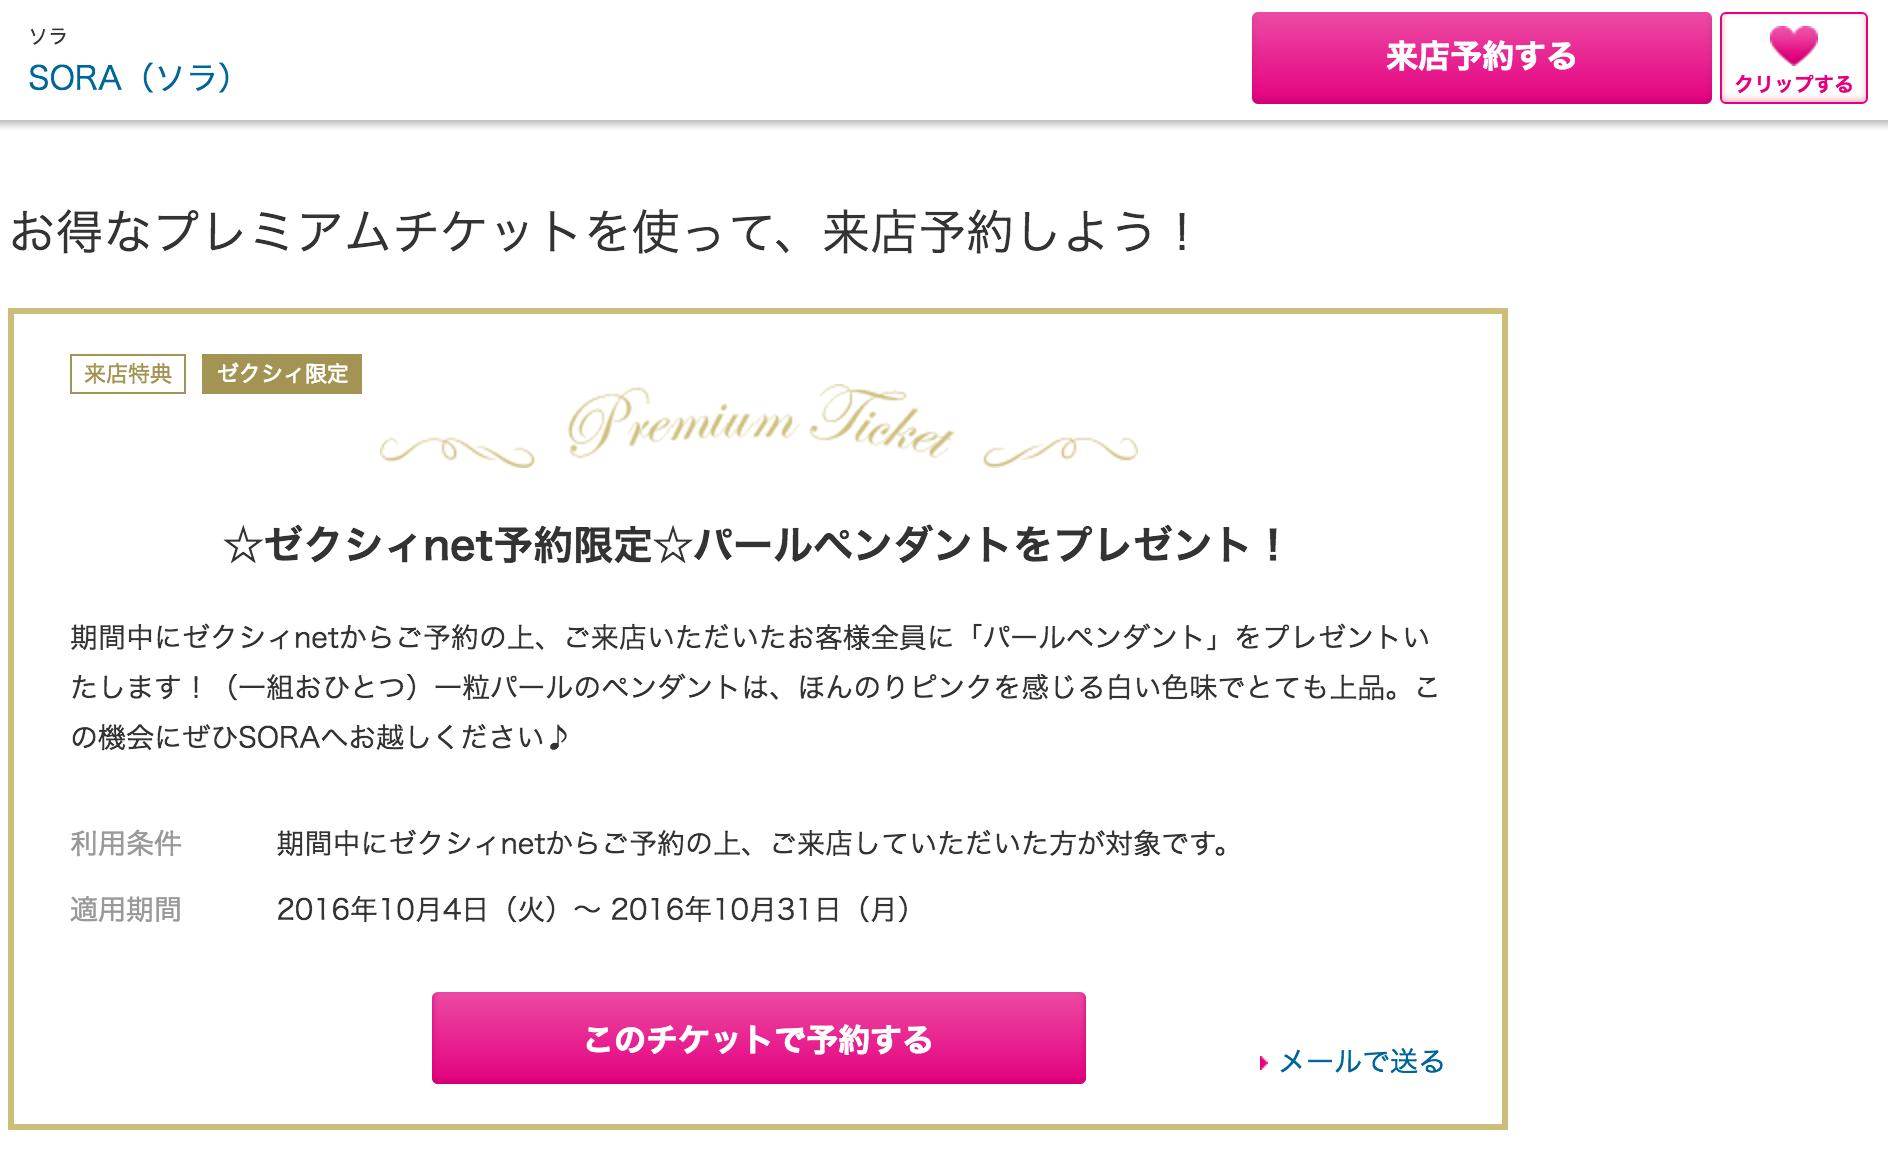 SORA ゼクシィnetからのWEB来店予約でパールペンダント無料プレゼント!